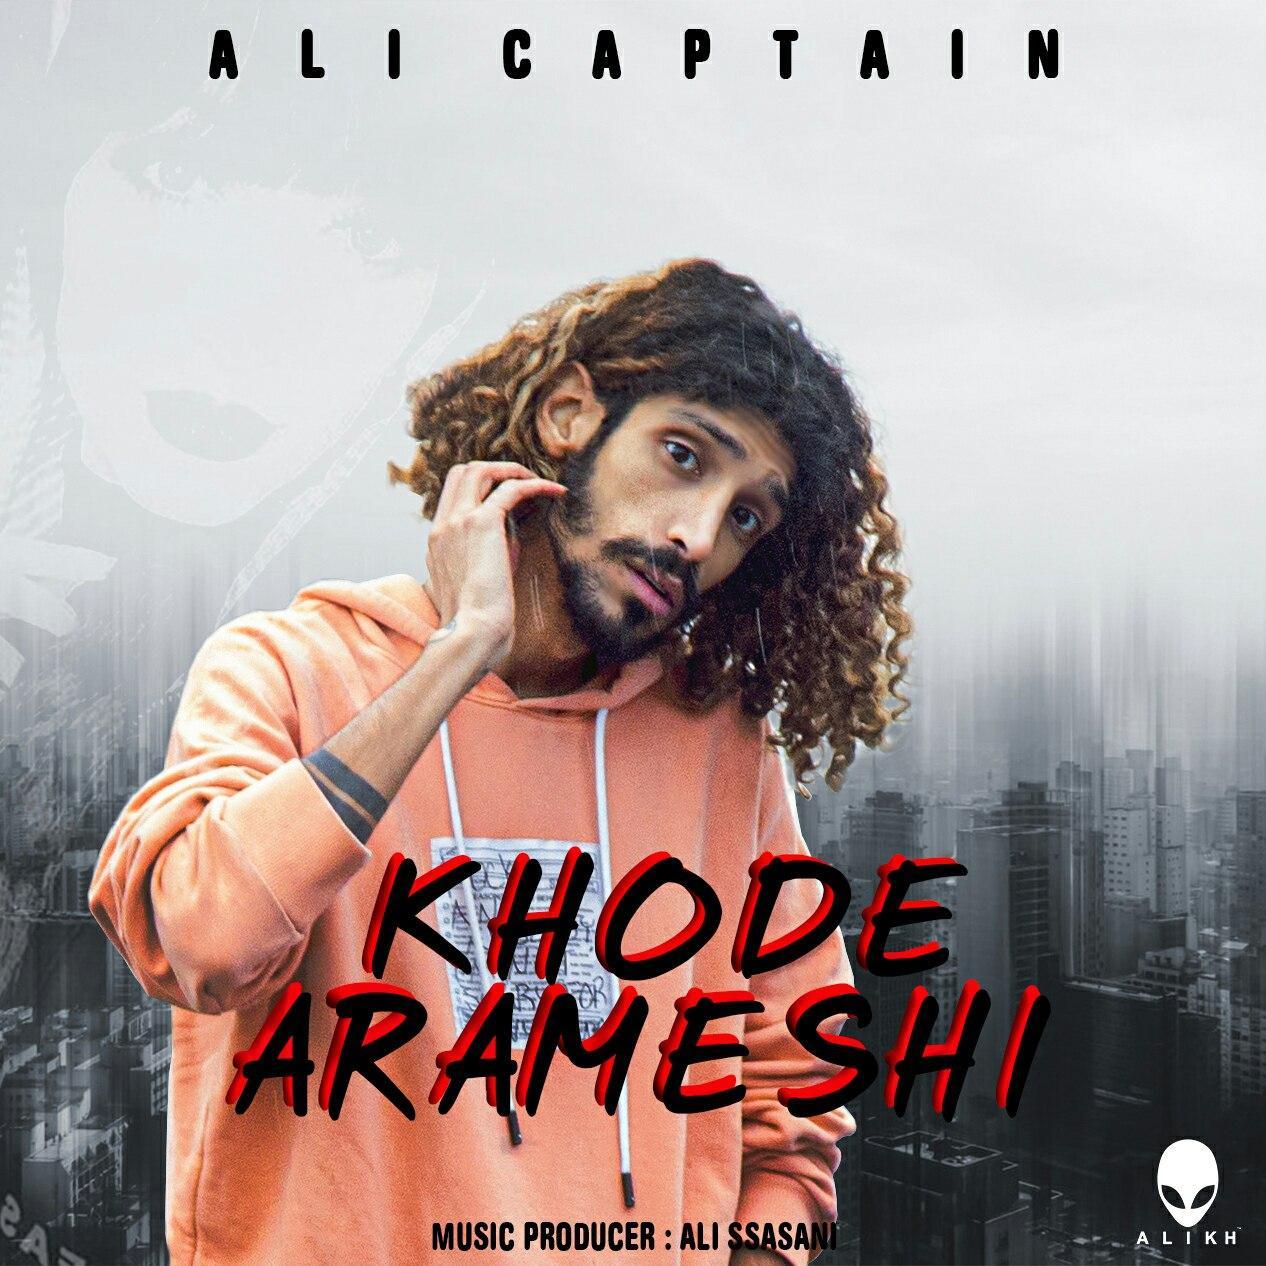 Ali Captain – Khode Arameshi